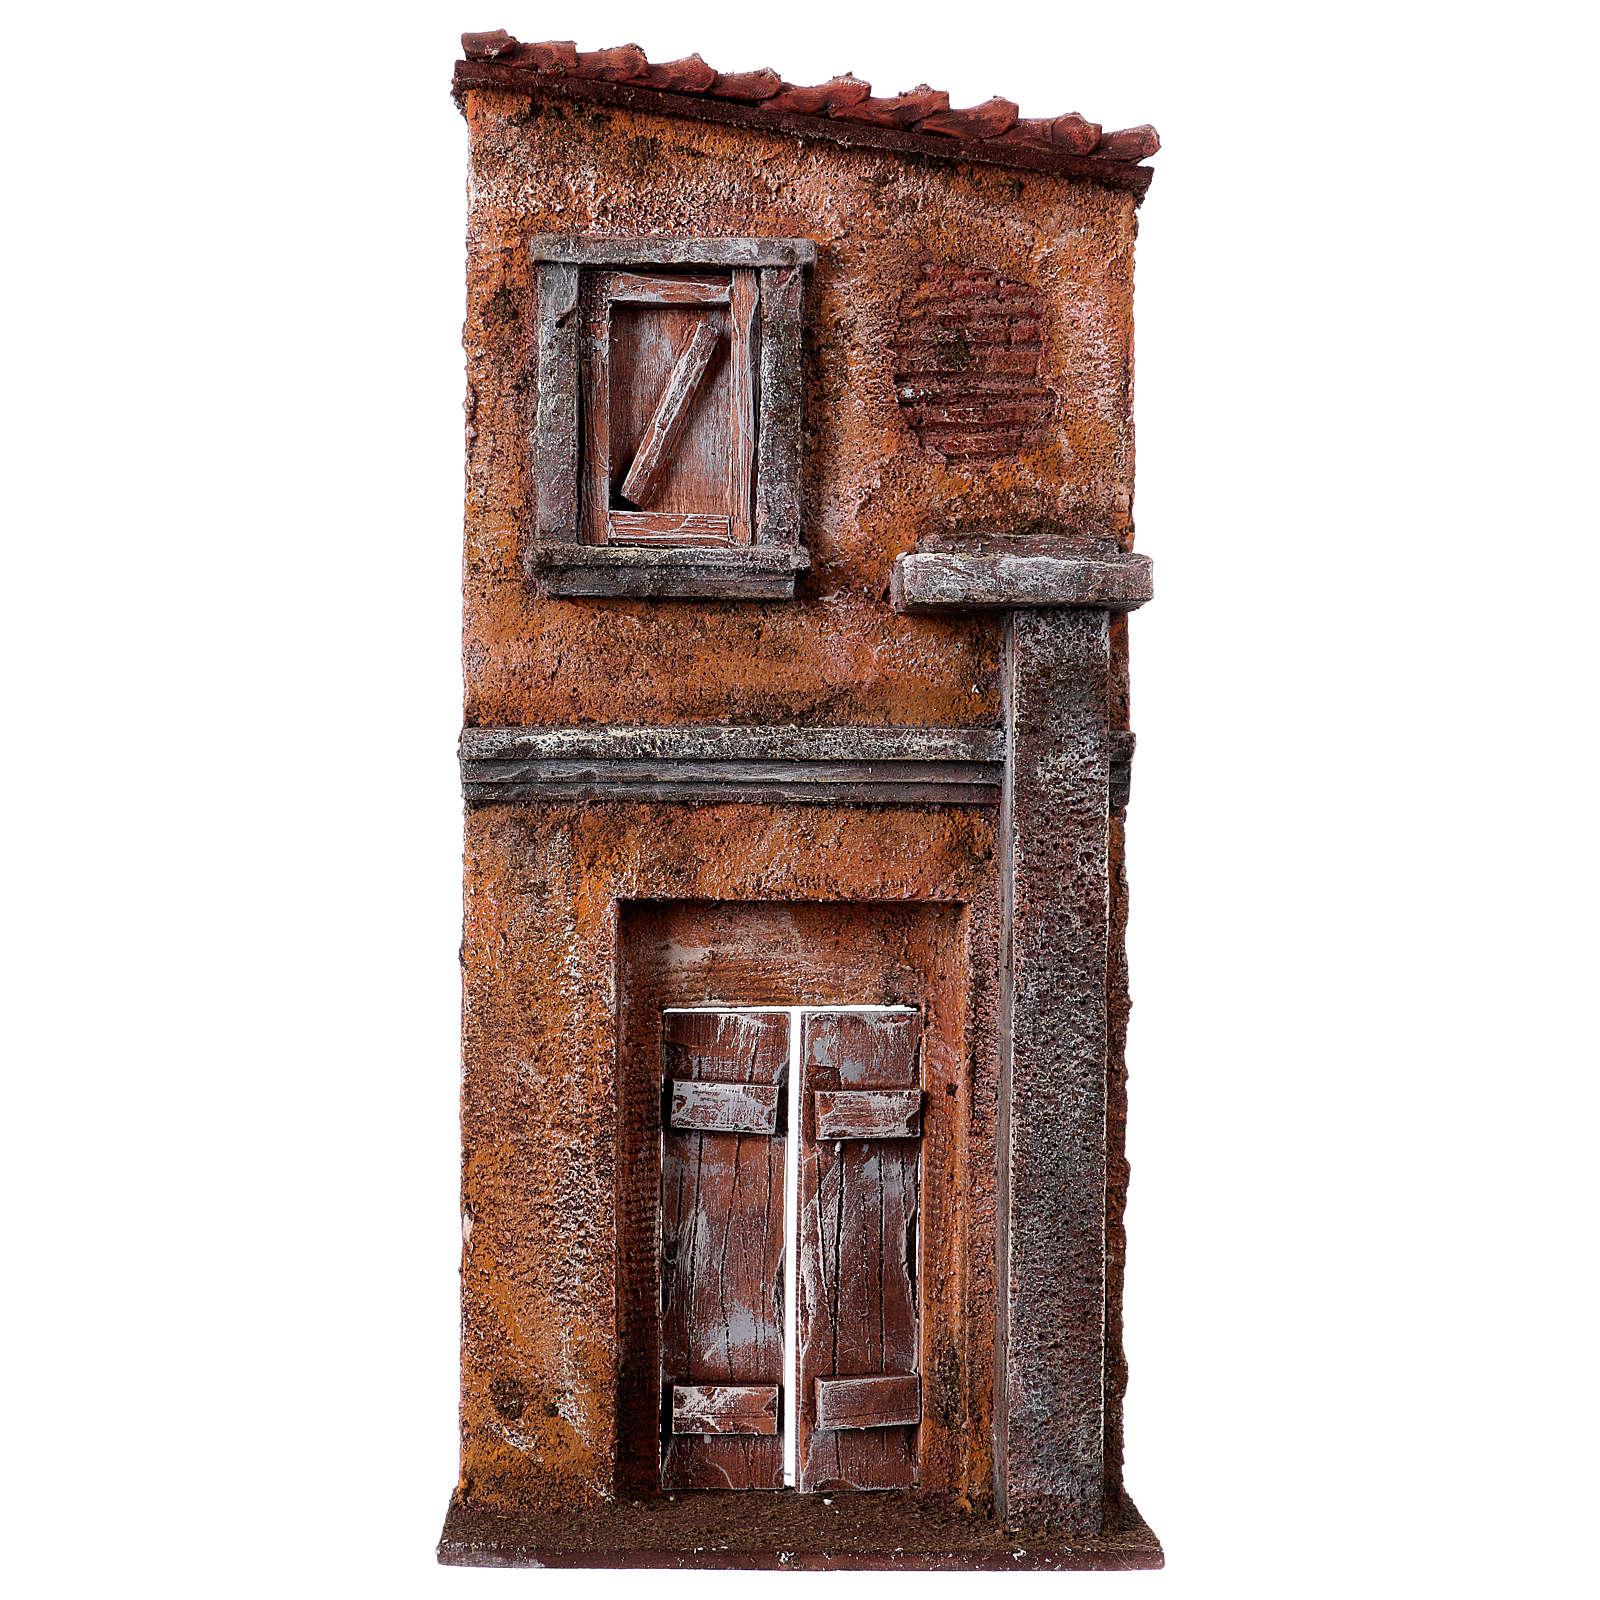 Fachada puerta central ventana izquierda para belén 9 cm 32x15x5 cm 4